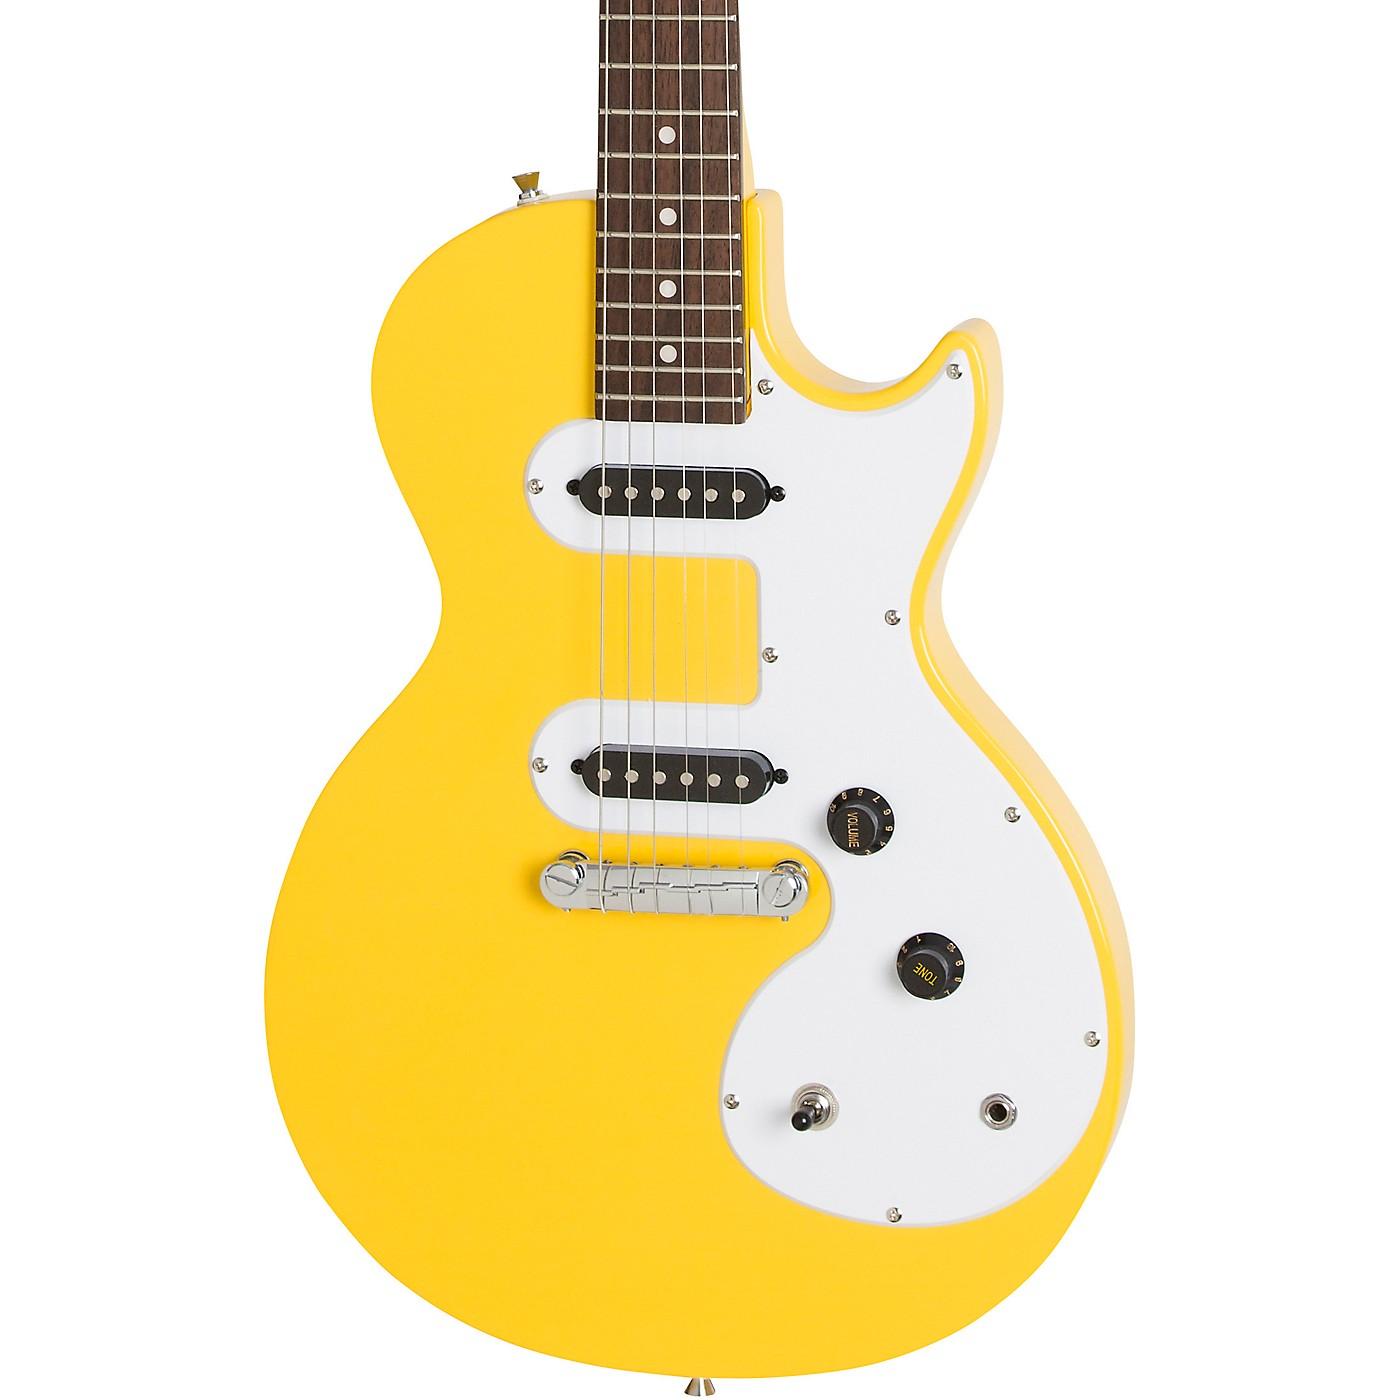 Epiphone Les Paul Melody Maker E1 Electric Guitar thumbnail